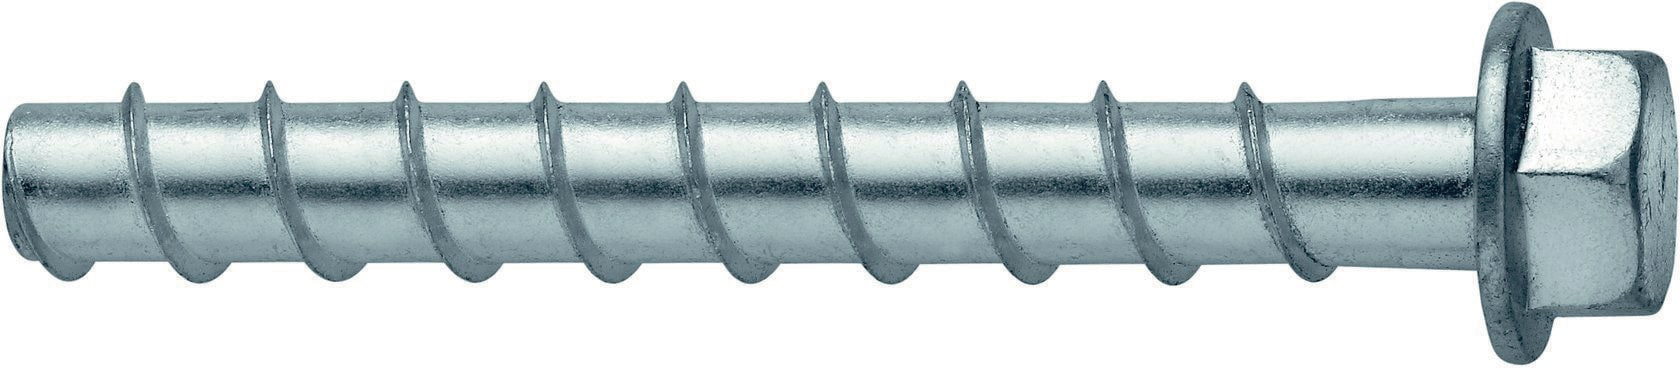 30-Pack Hilti 418061 3//8-inch x 5-inch Kwik Hus-EZ Concrete and Masonry Screw Anchors